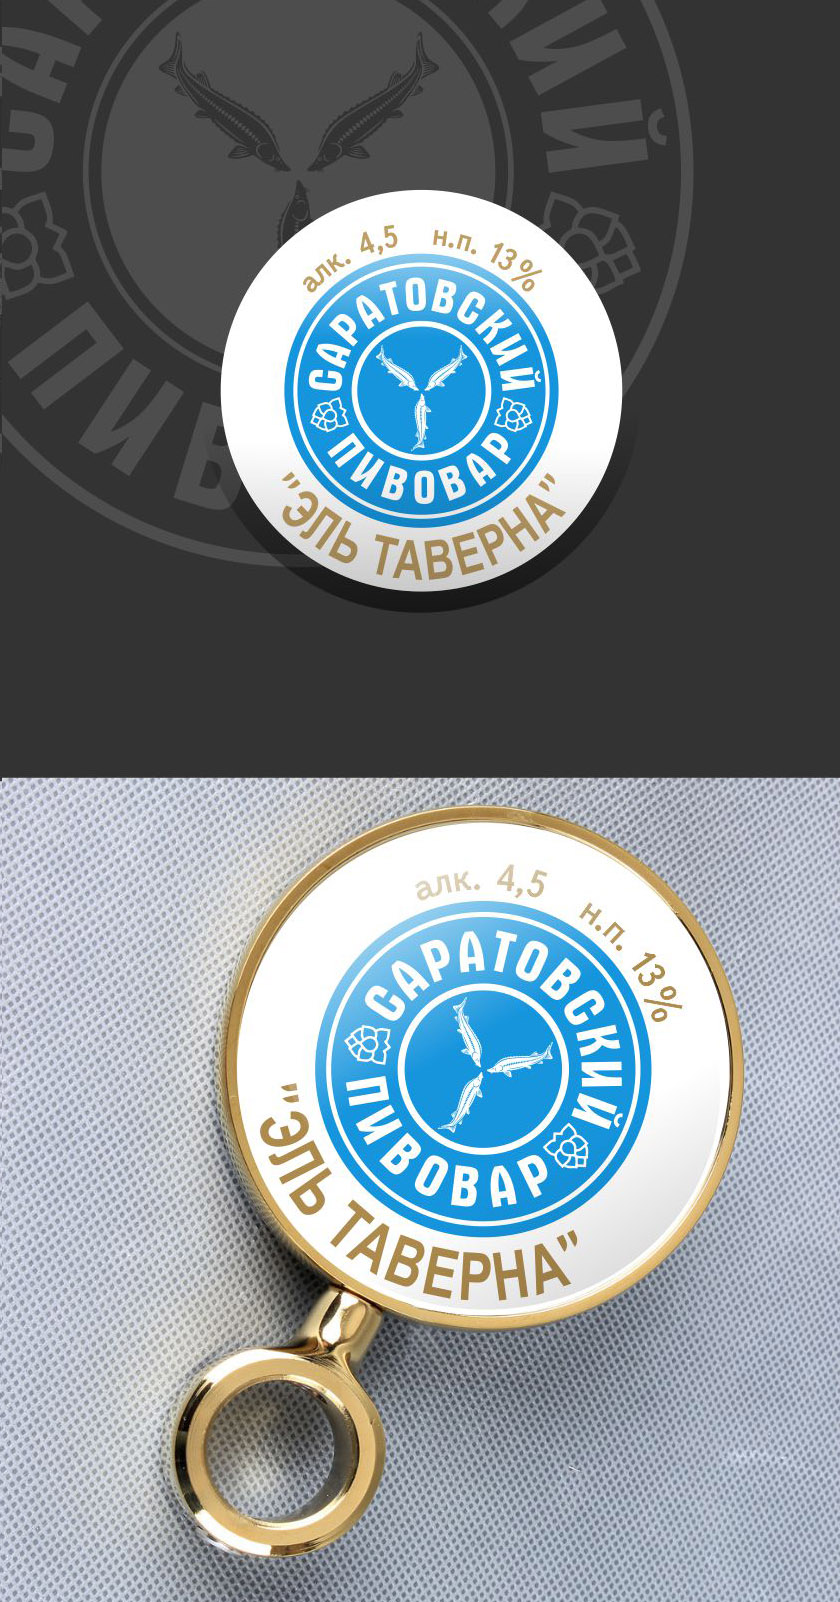 Разработка логотипа для частной пивоварни фото f_6675d7a8813a0694.jpg